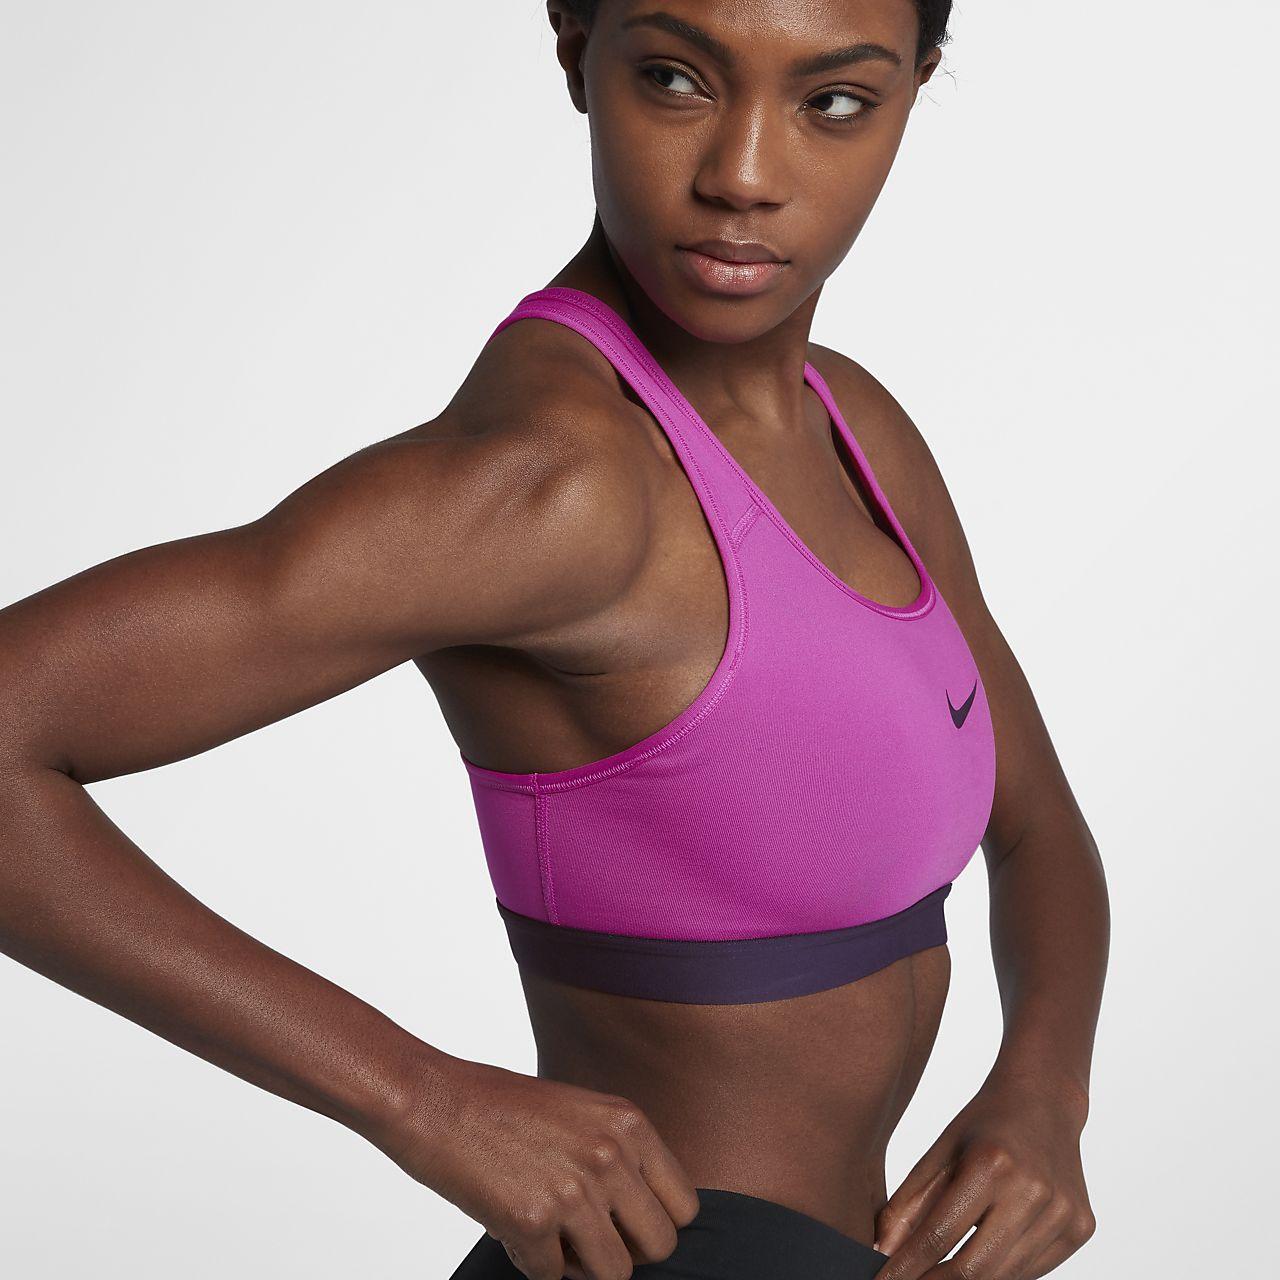 ... Nike Classic Padded Women's Medium Support Sports Bra